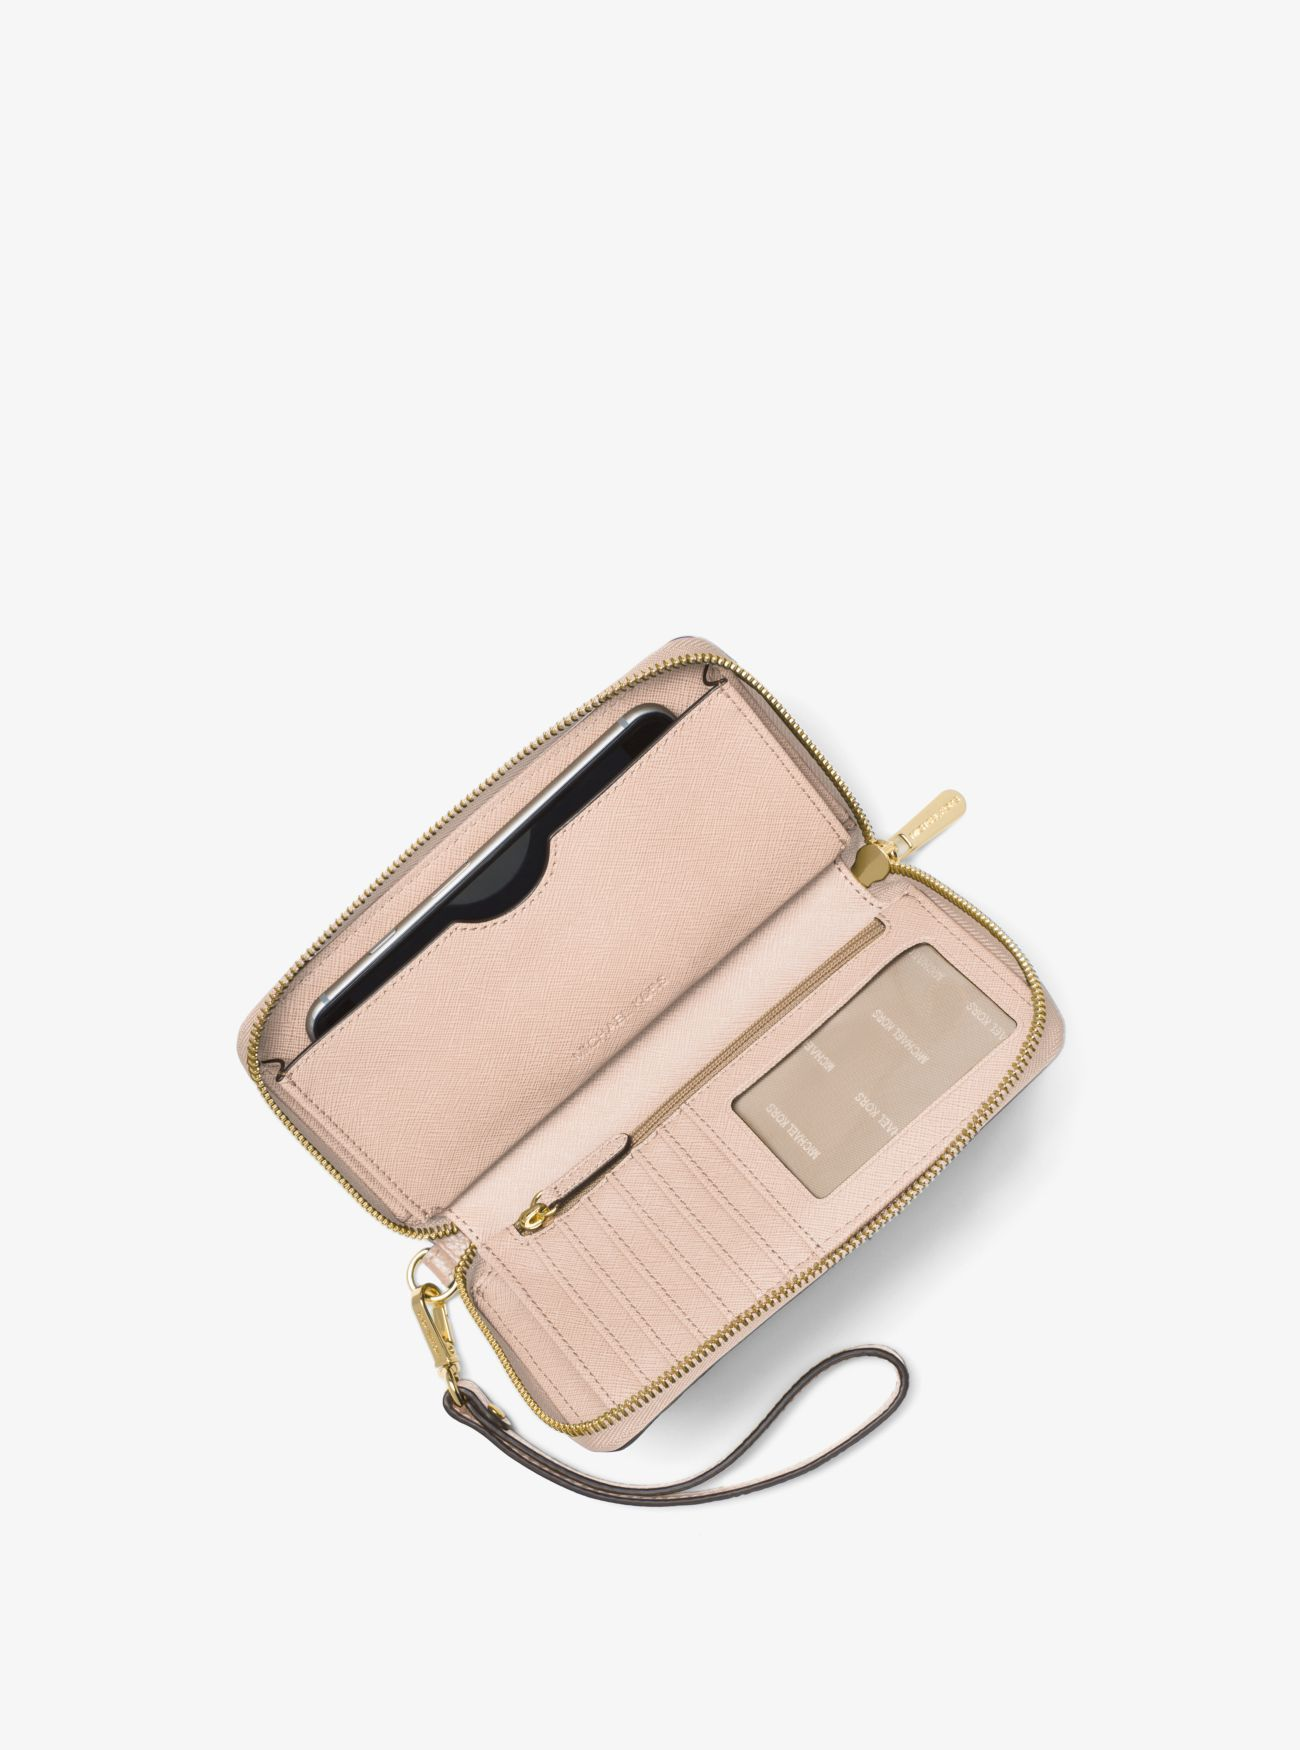 3c68363c691c Large Leather Smartphone Wristlet. Large Leather Smartphone Wristlet Zip  Around Wallet ...